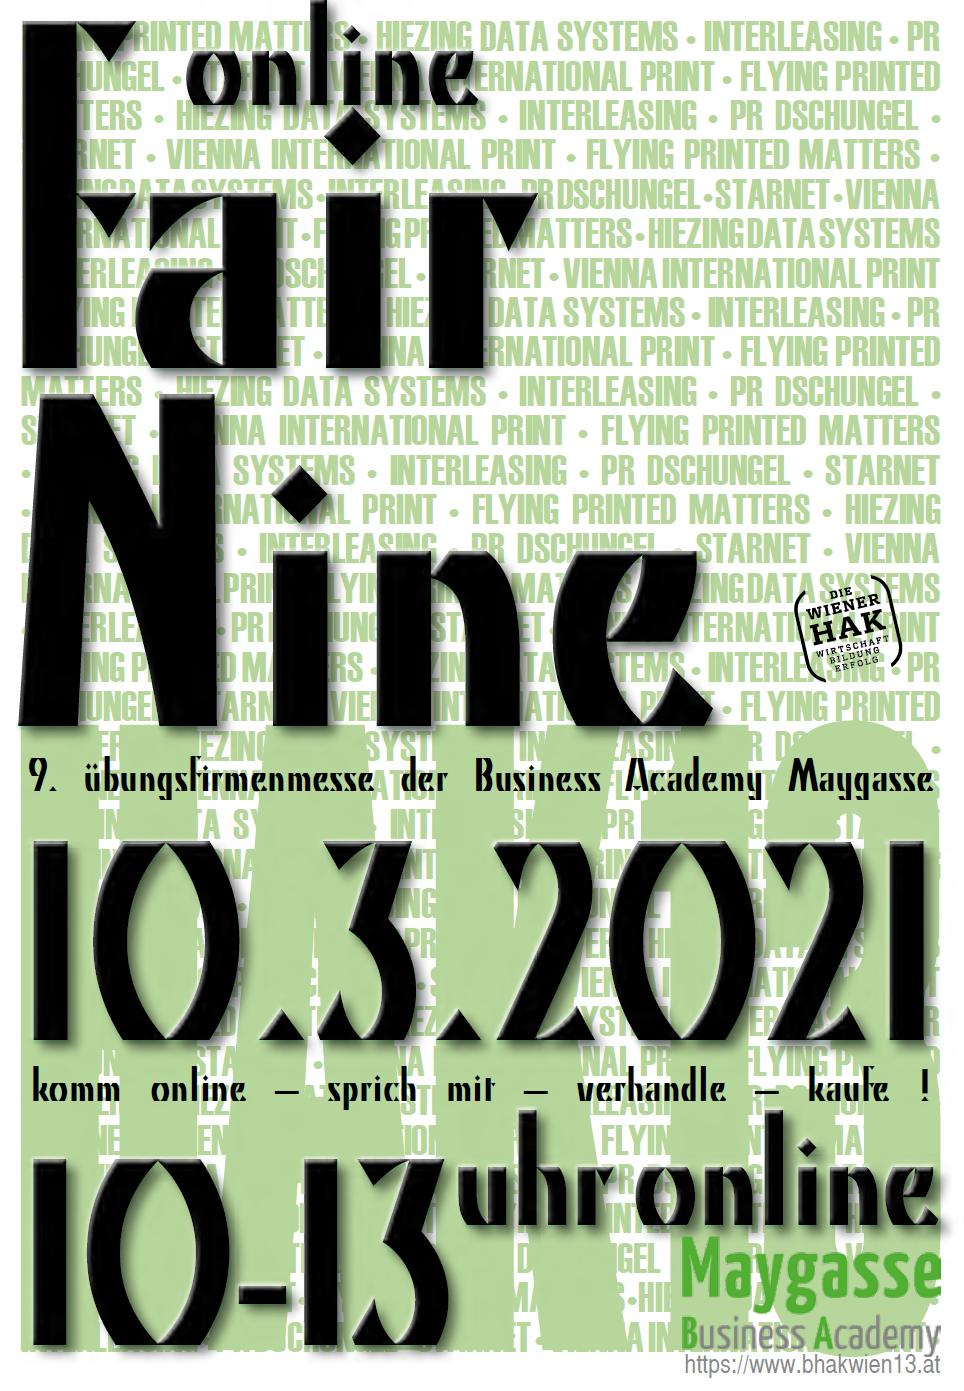 Online Trading FIX — Übungsfirmenmesse neu gedacht — 10. März2021